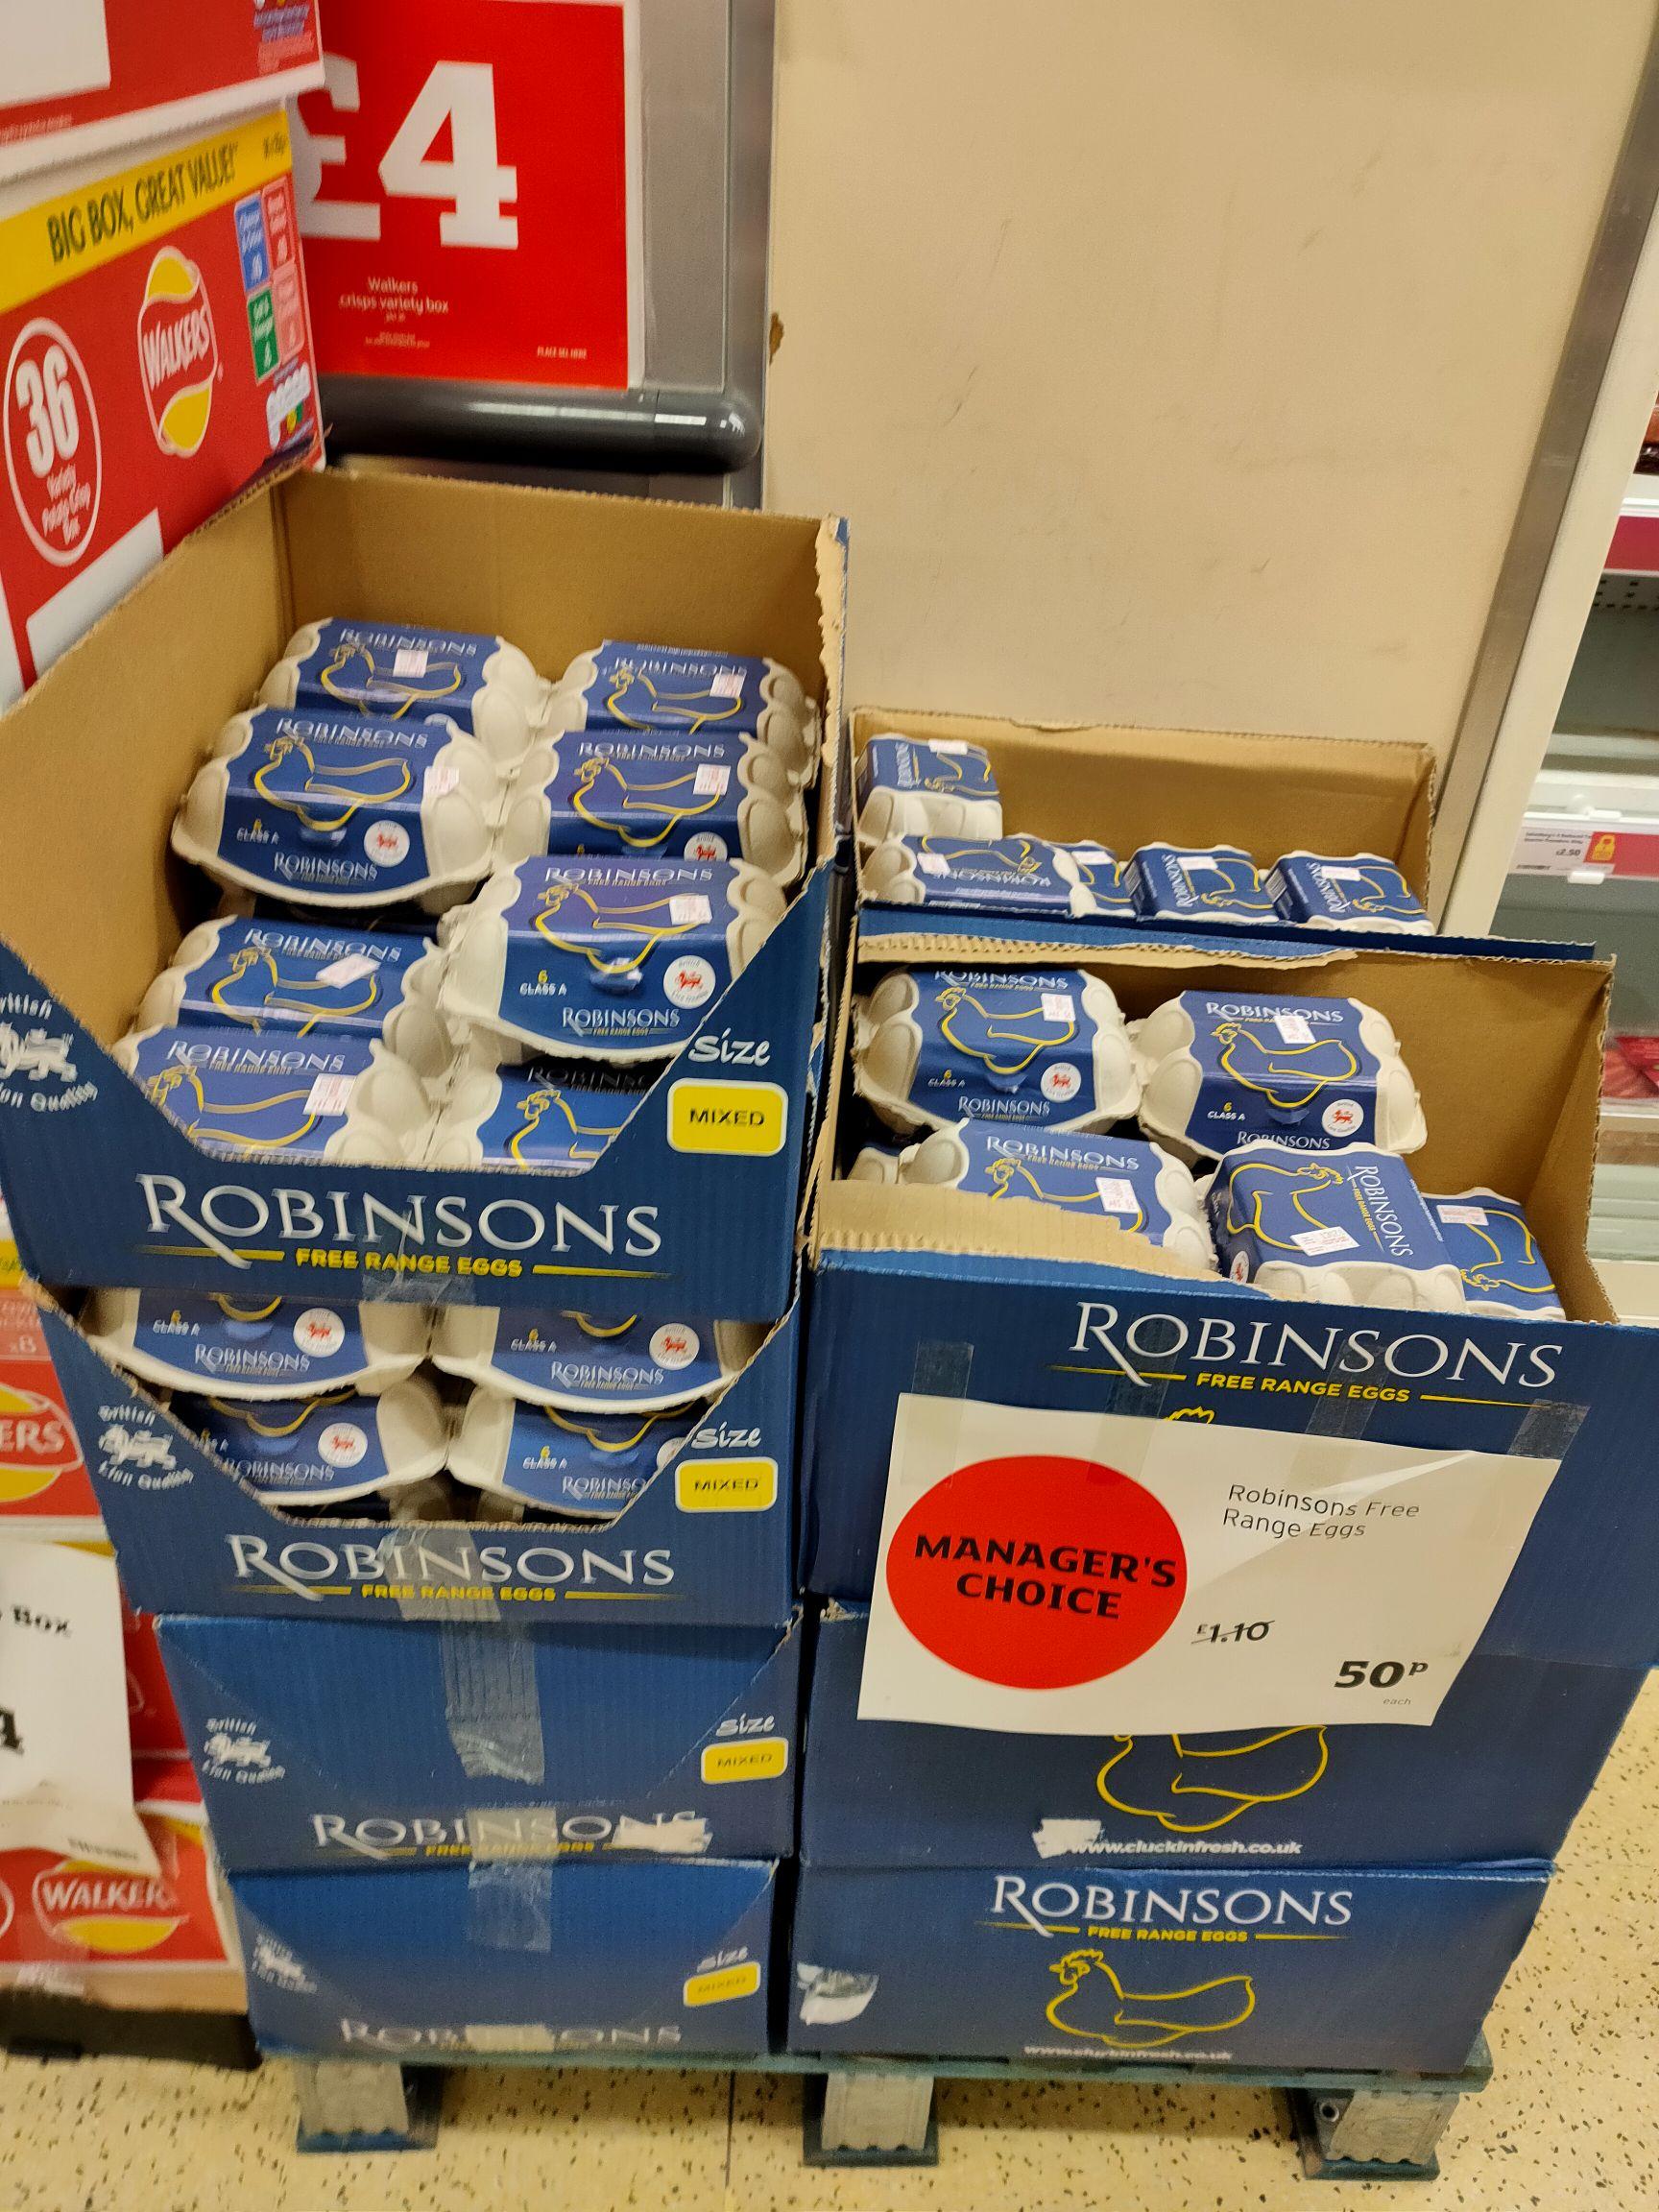 6 x Robinson's Free Range Eggs - 50p @ Sainsbury's